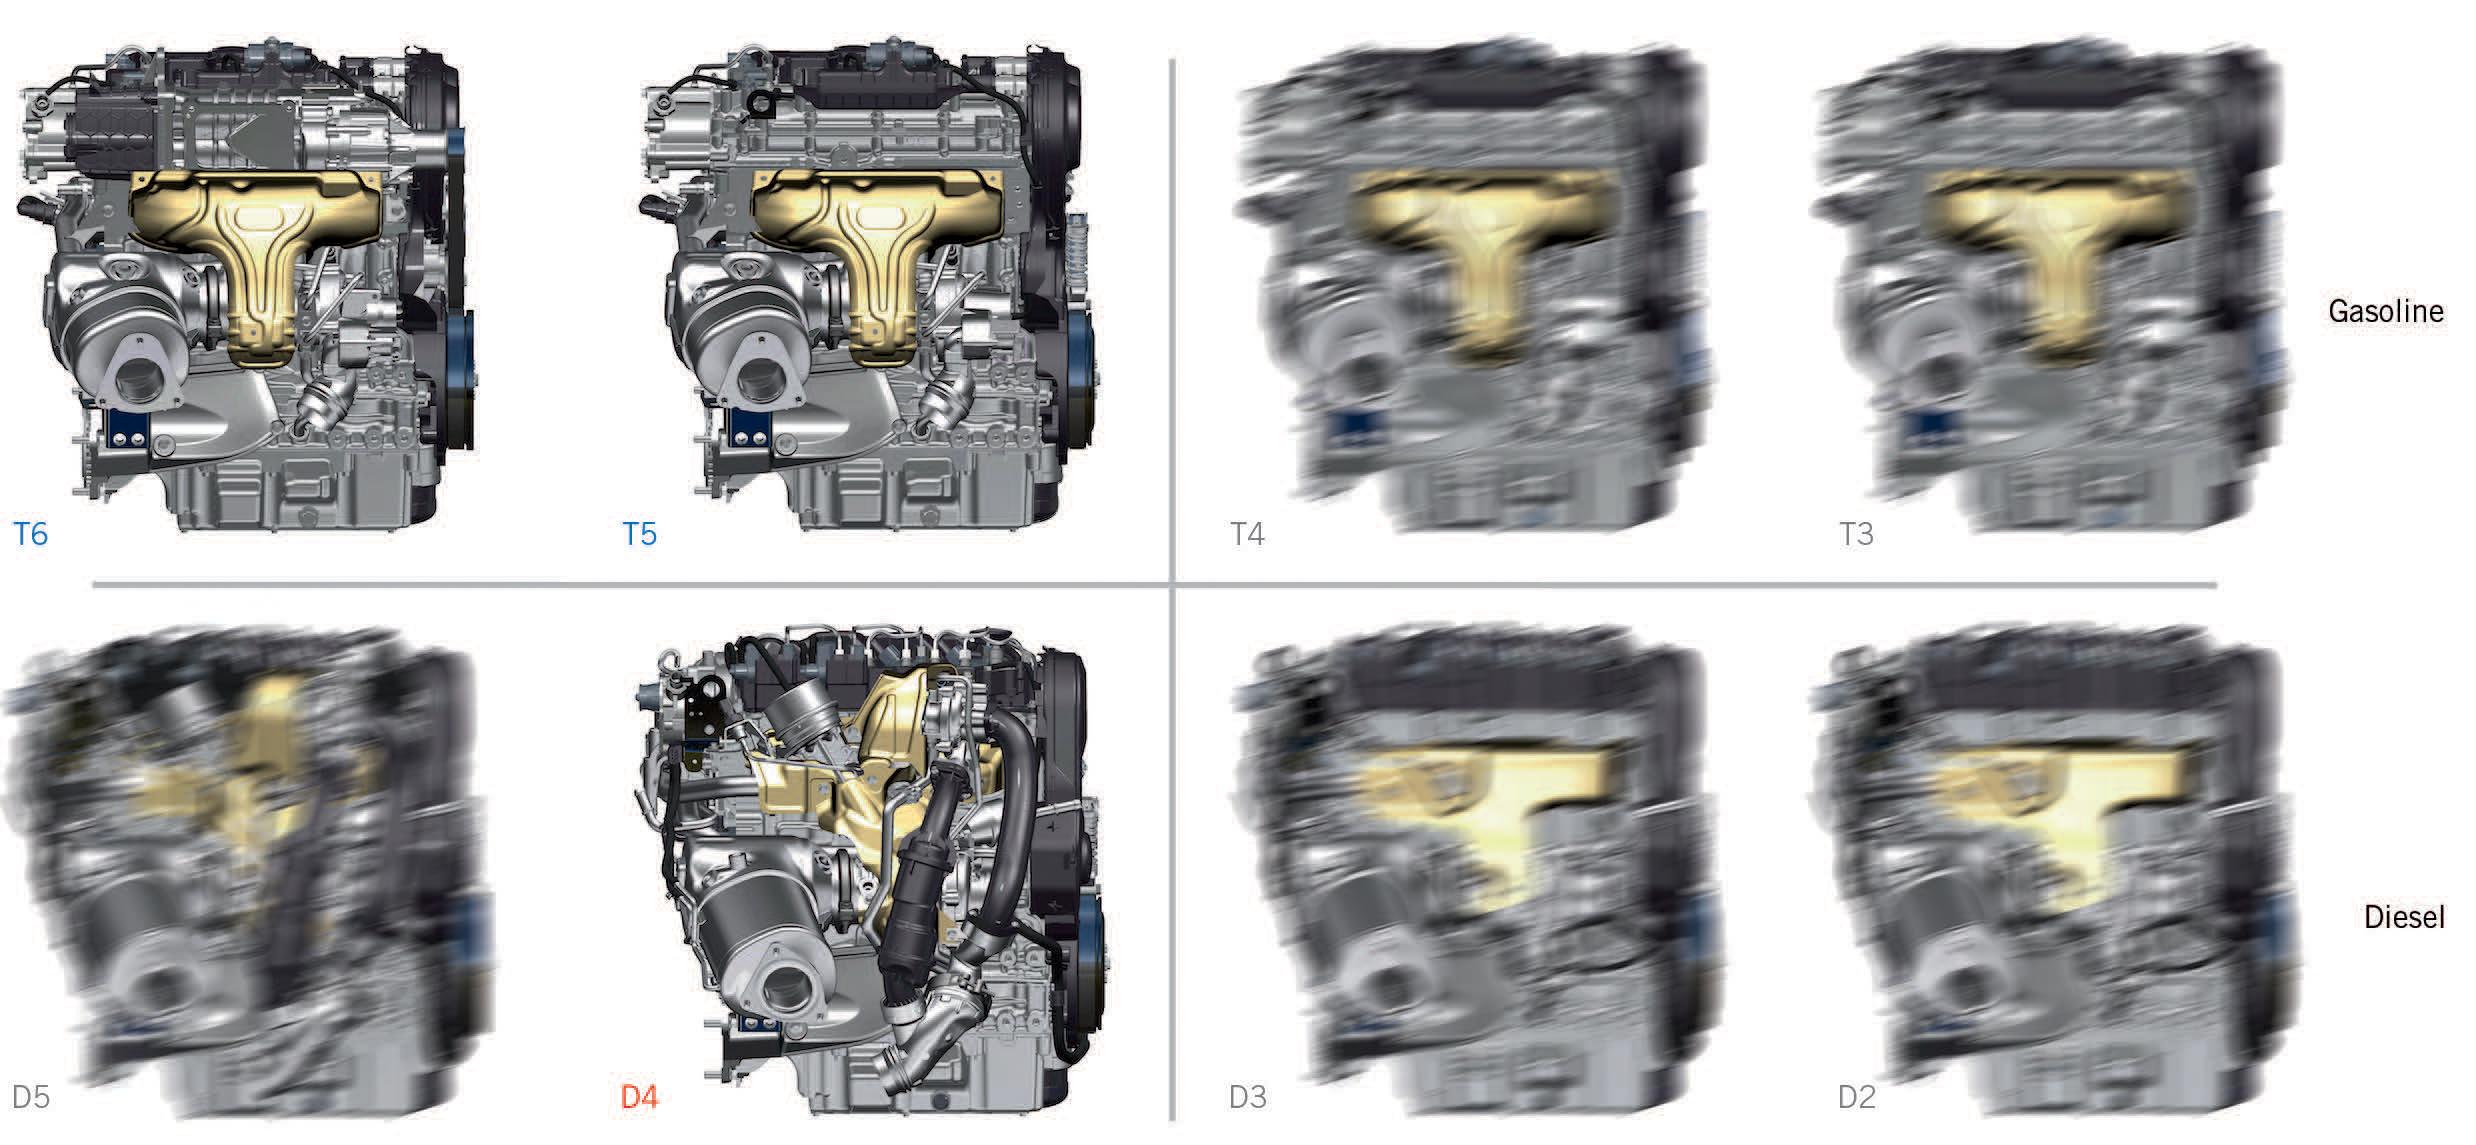 New Modular Engine Platform from Volvo | SpringerLink